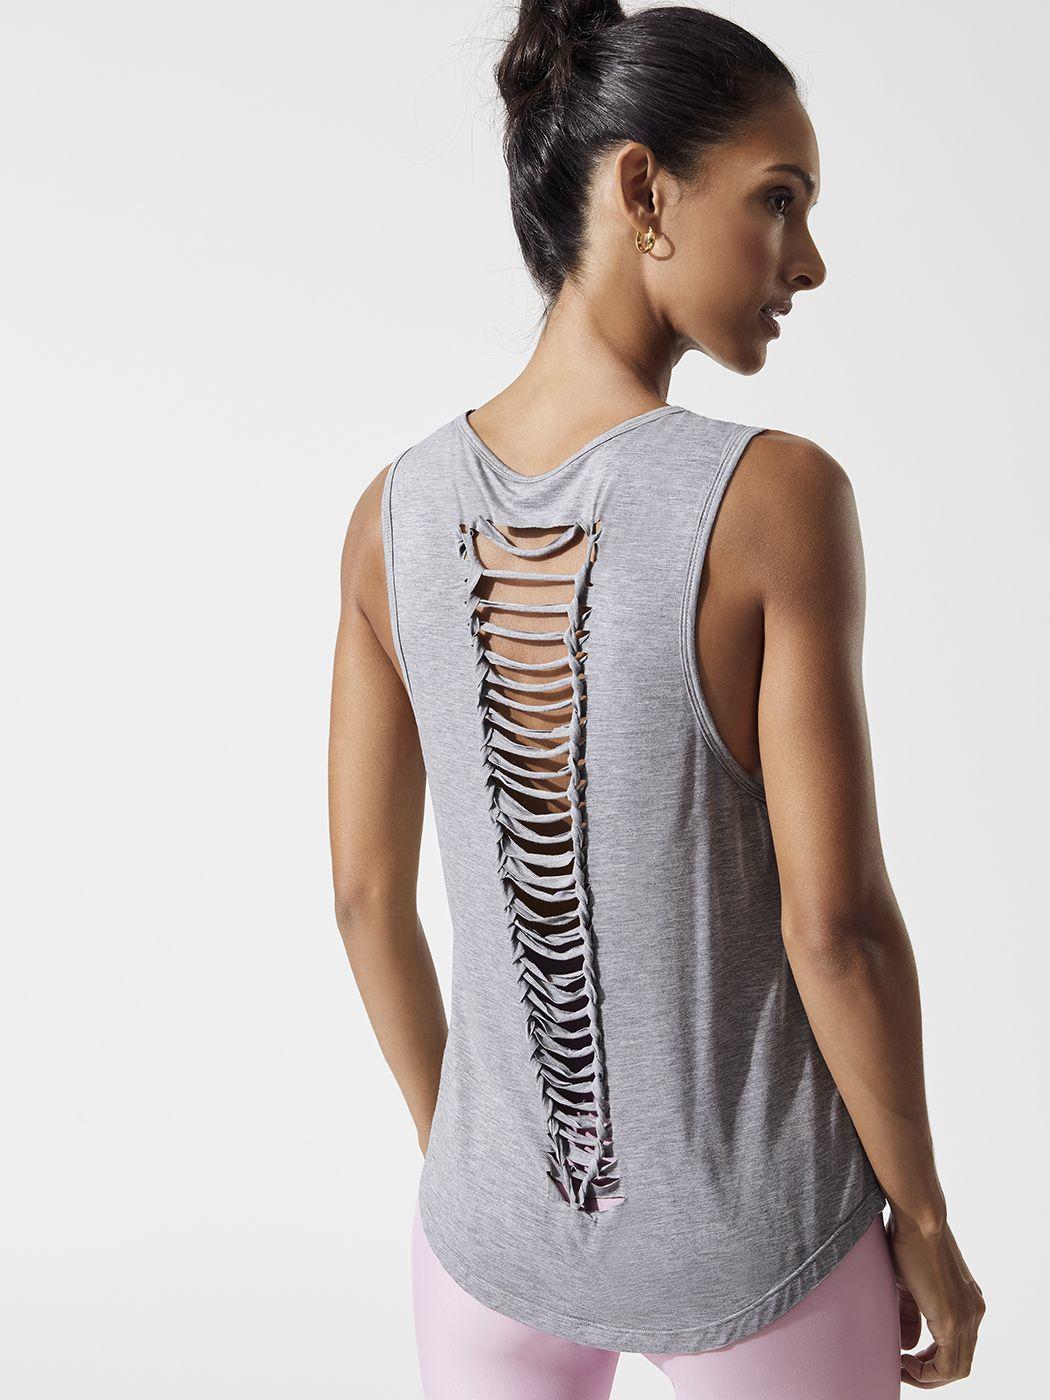 823321c112a0f Carbon38 Pearl Tank - Heather Grey - Fashion Activewear Running - Heather  Grey